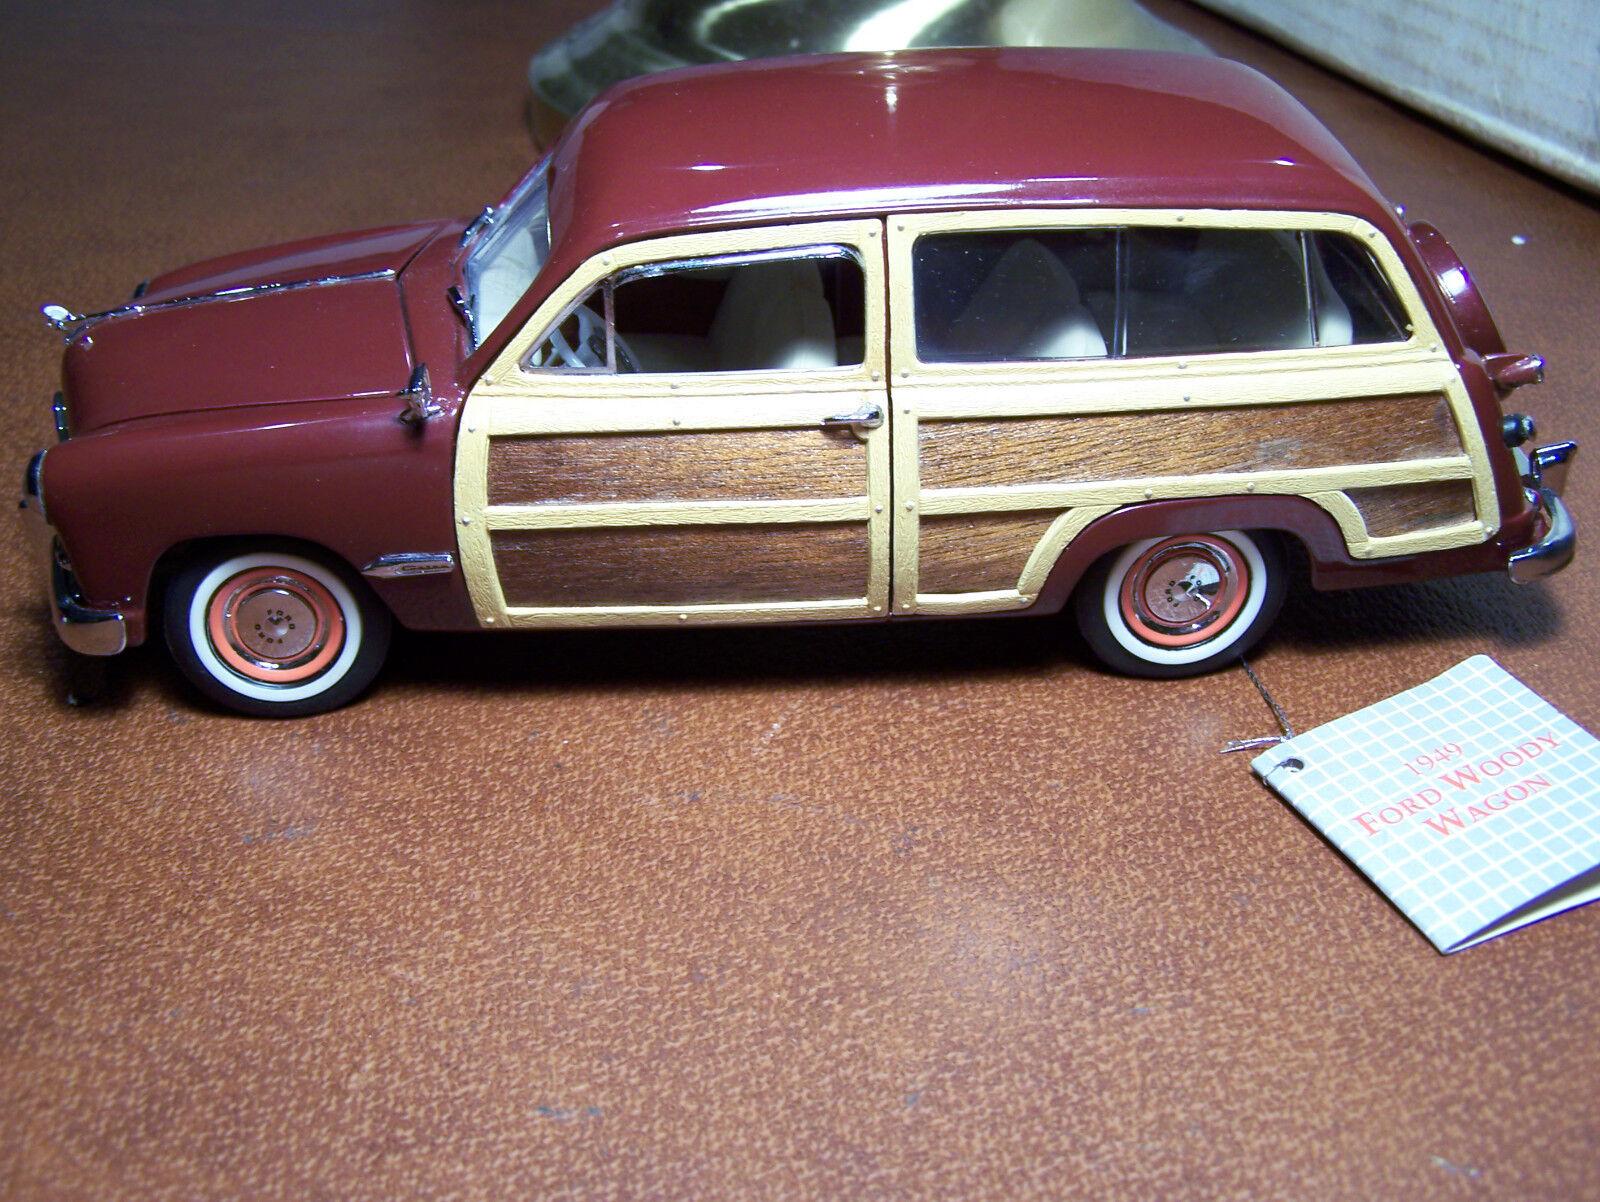 MIB FRANKLIN MINT 1 24 DIE-CAST  1949 FORD WOODY WAGON W  BOX AND PAPERWORK